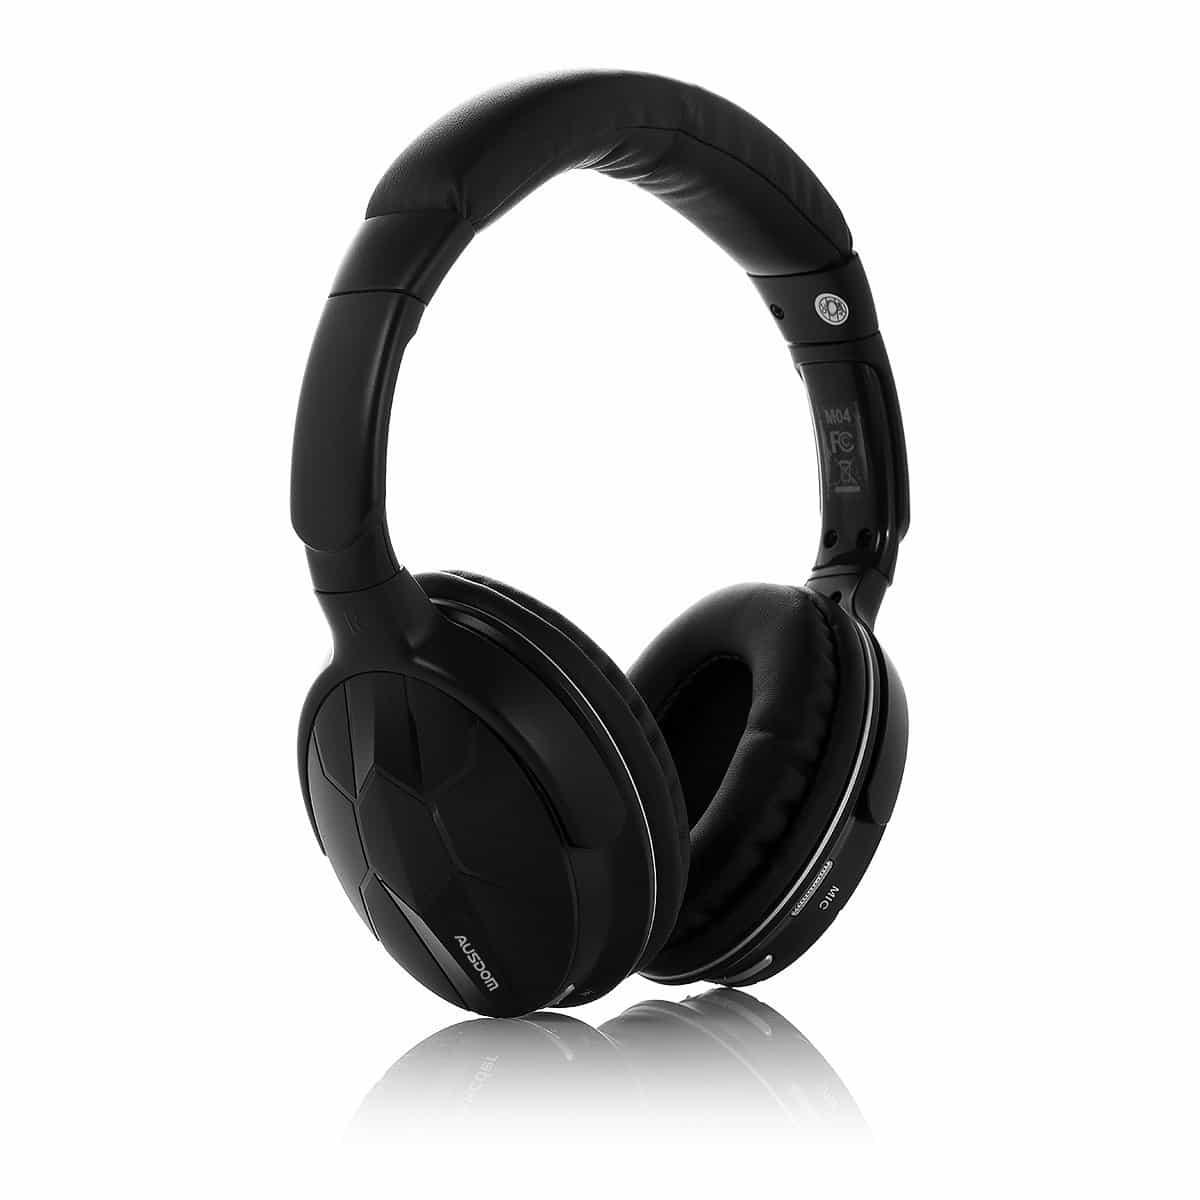 Ausdom M04 Bluetooth Headphones Review Bluedio Ufo Premium Wireless Headset High End